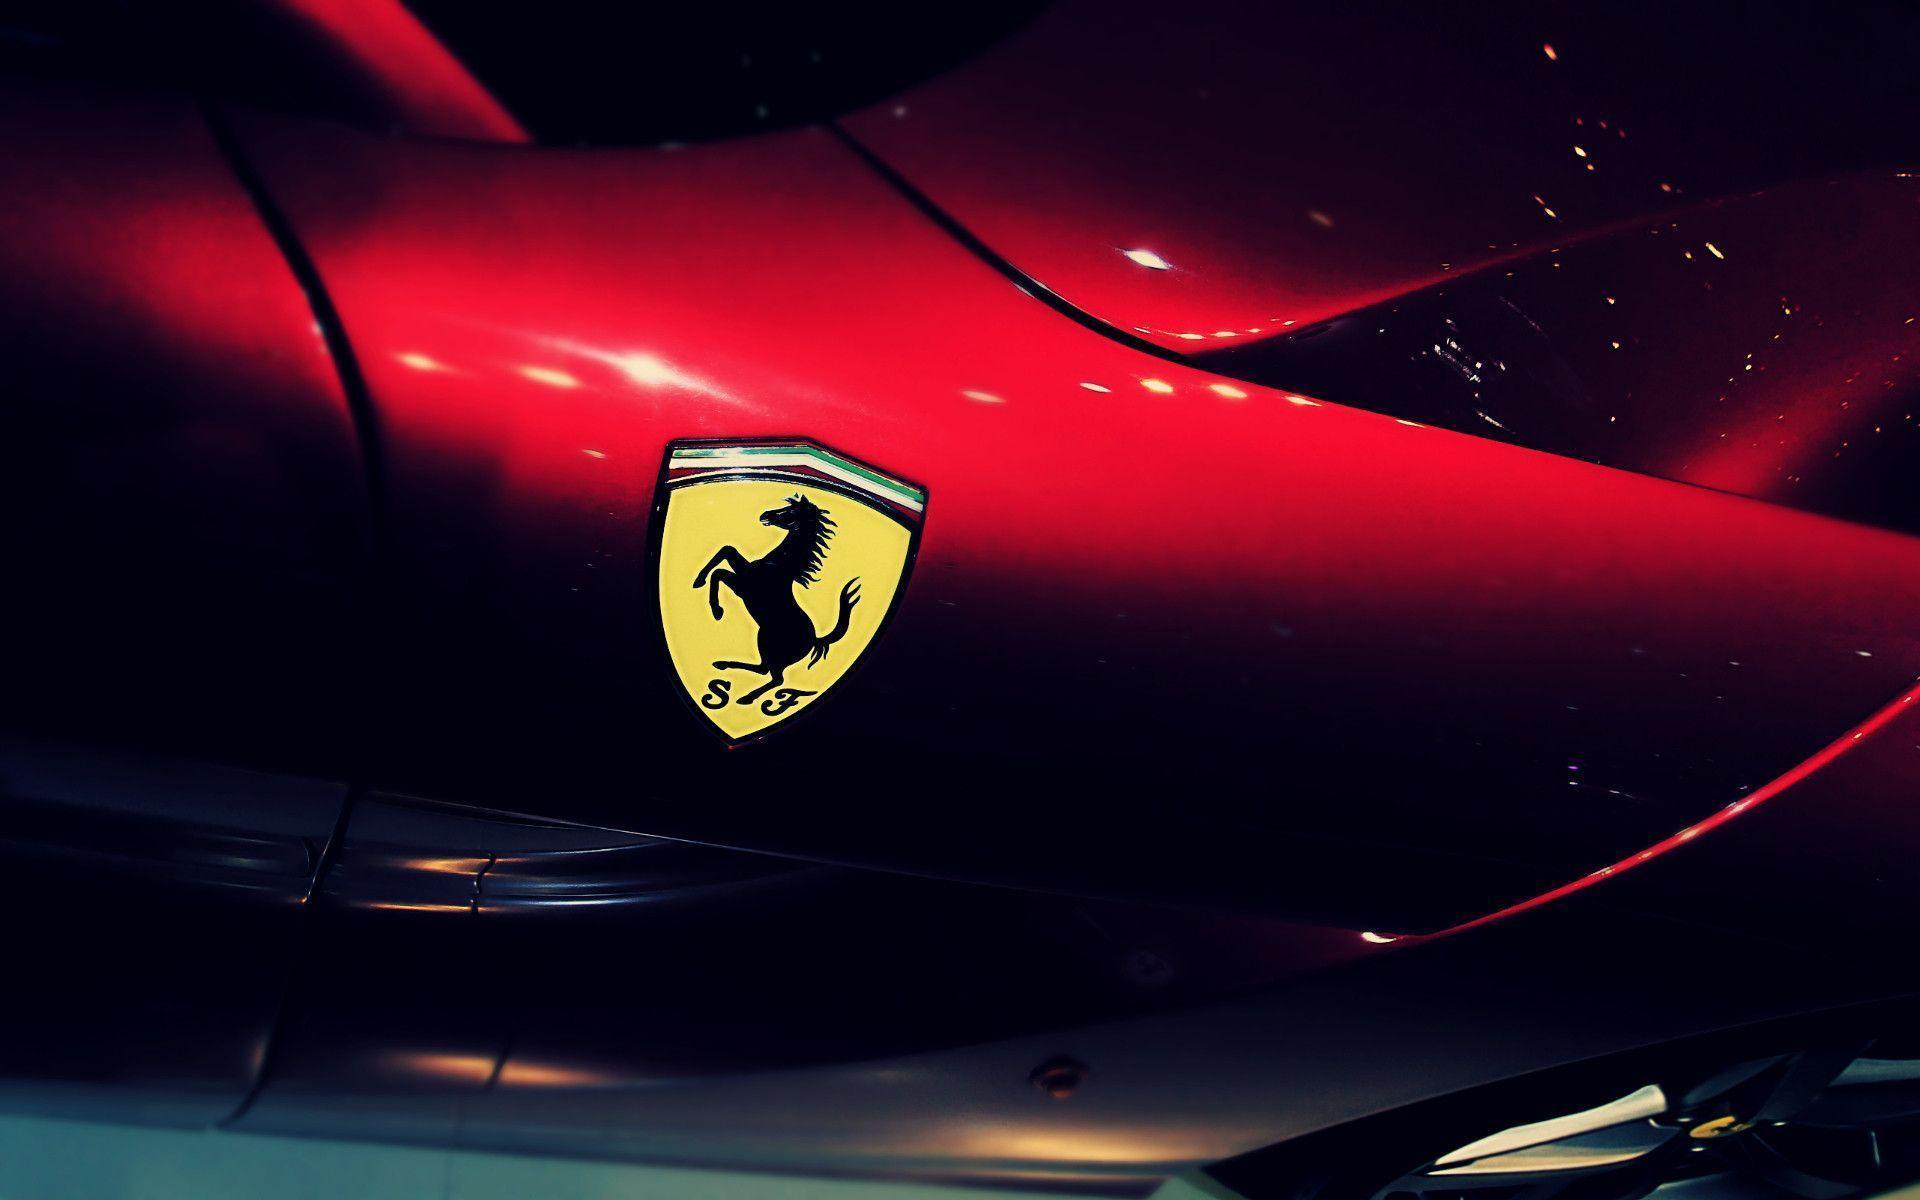 Ferrari logo wallpapers wallpaper cave - Car logo wallpapers ...